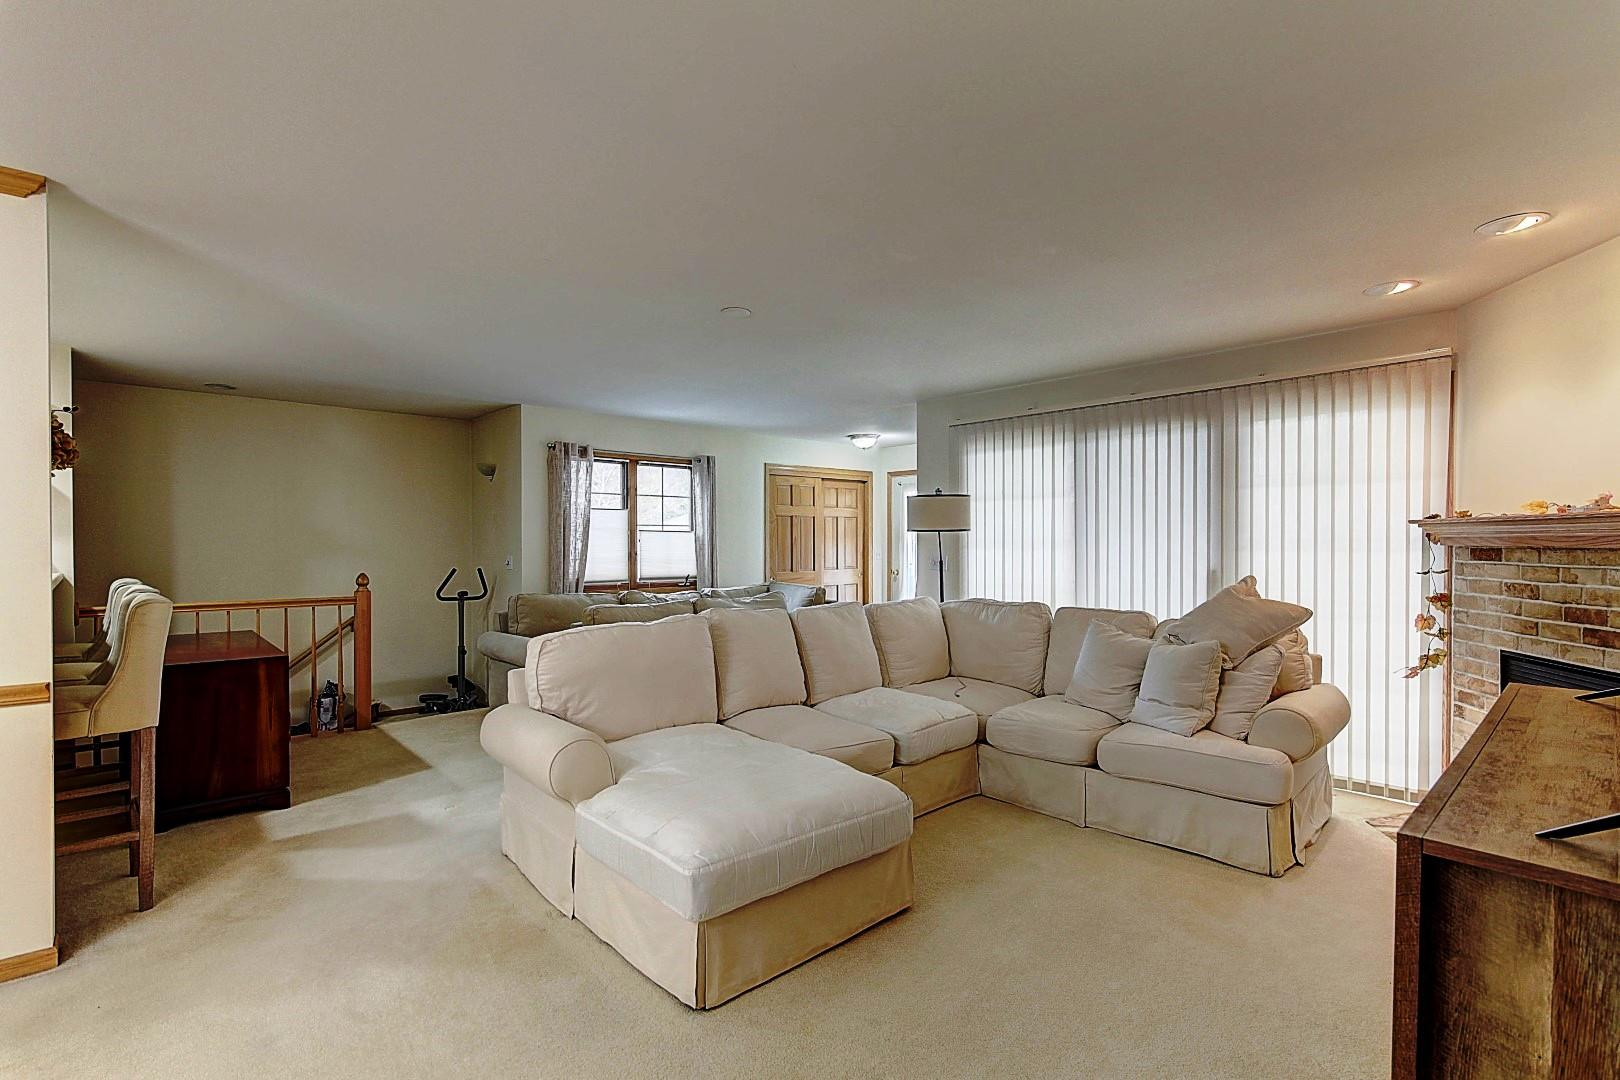 2293A Circle Rdg, Delafield, Wisconsin 53018, 3 Bedrooms Bedrooms, 8 Rooms Rooms,3 BathroomsBathrooms,Condominiums,For Sale,Circle Rdg,1,1732385